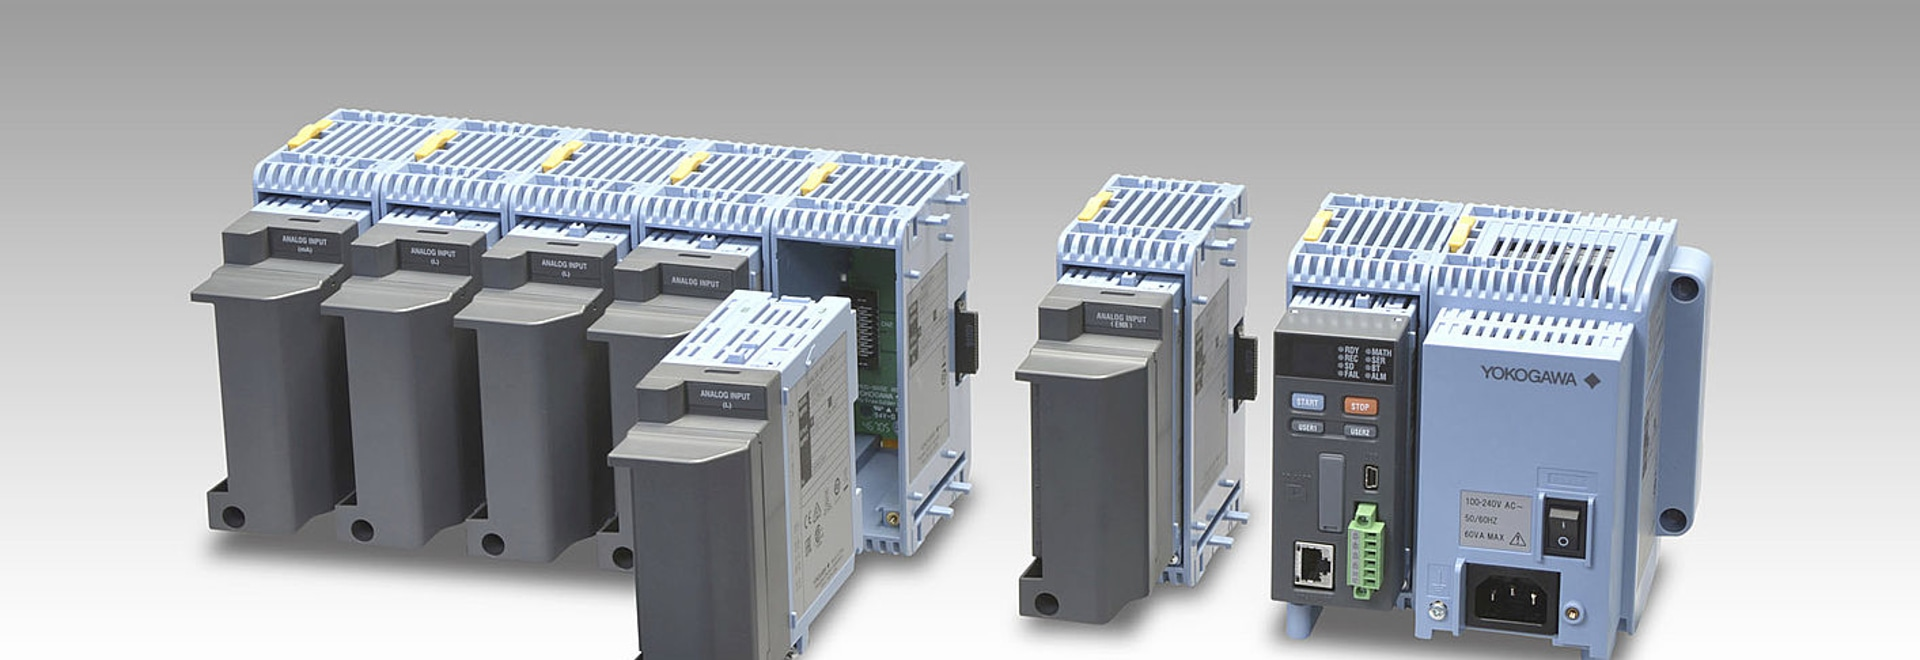 Yokogawa releases SMARTDAC+(R) GM data acquisition system